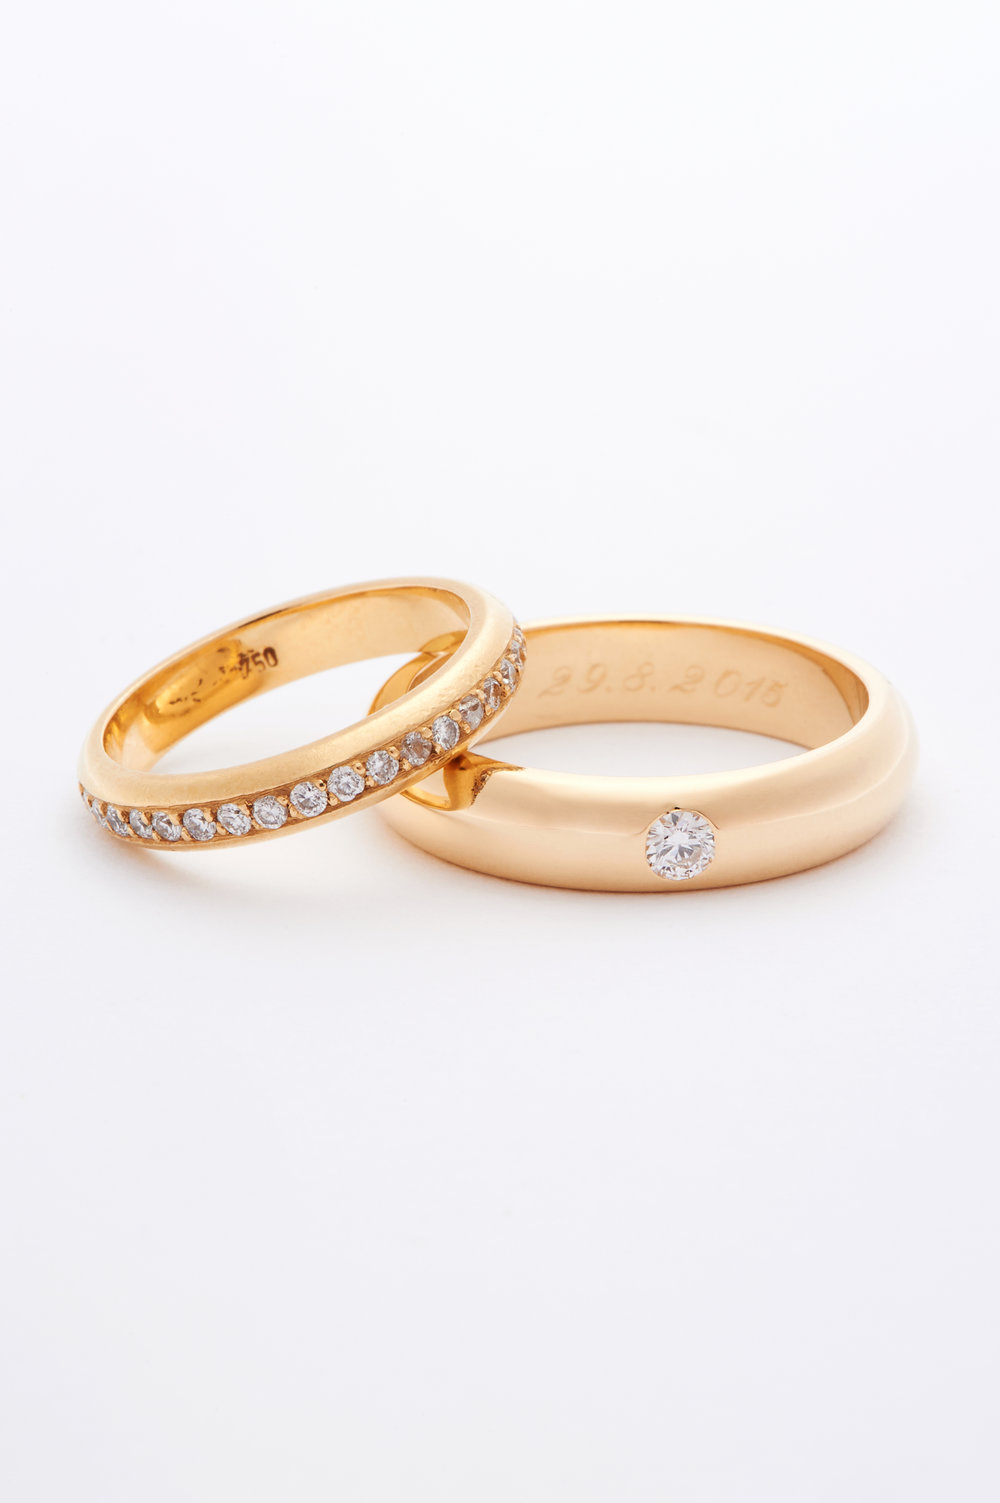 B.S //    GOLD 18K & DIAMONDS